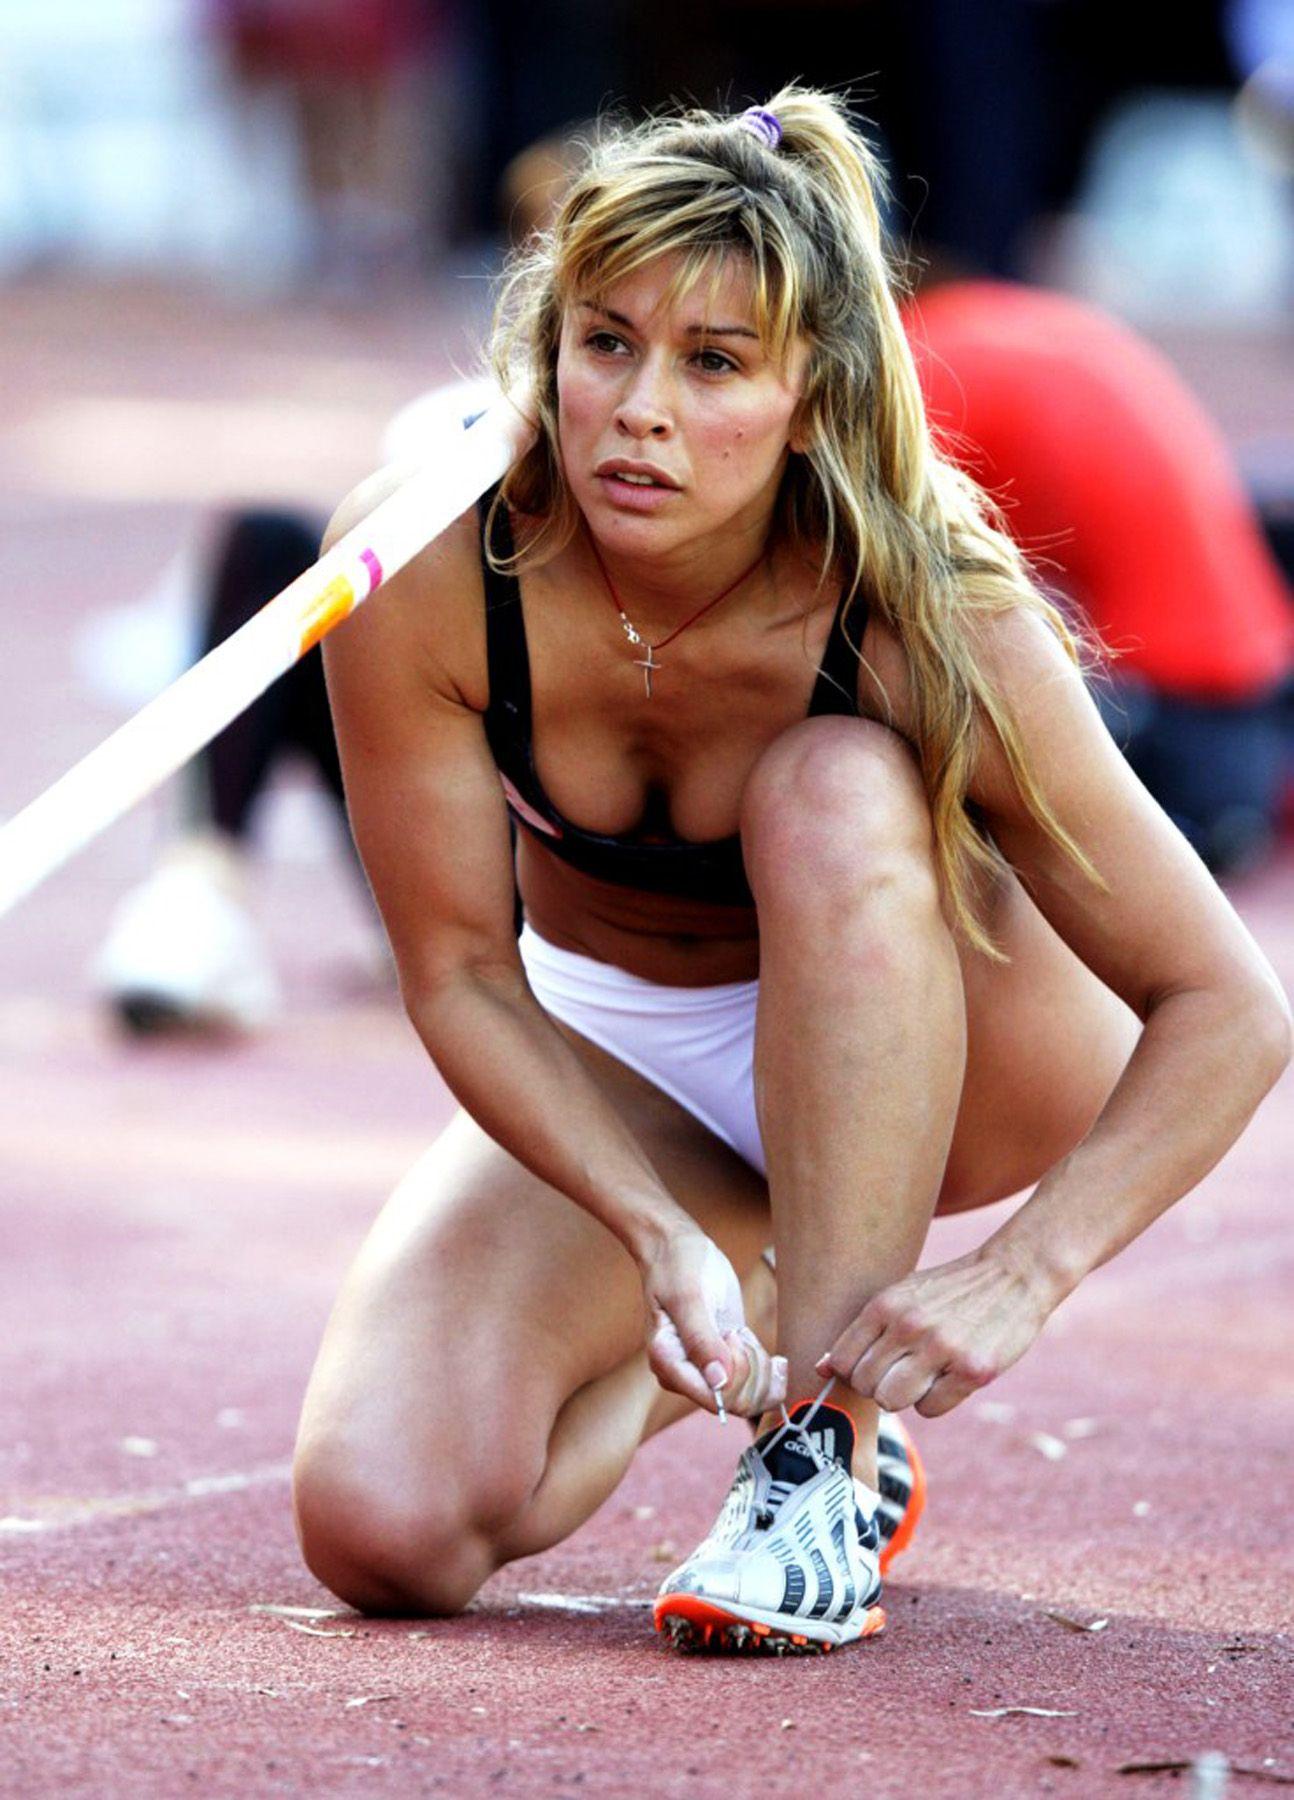 Sexiest pole vaulter — photo 7